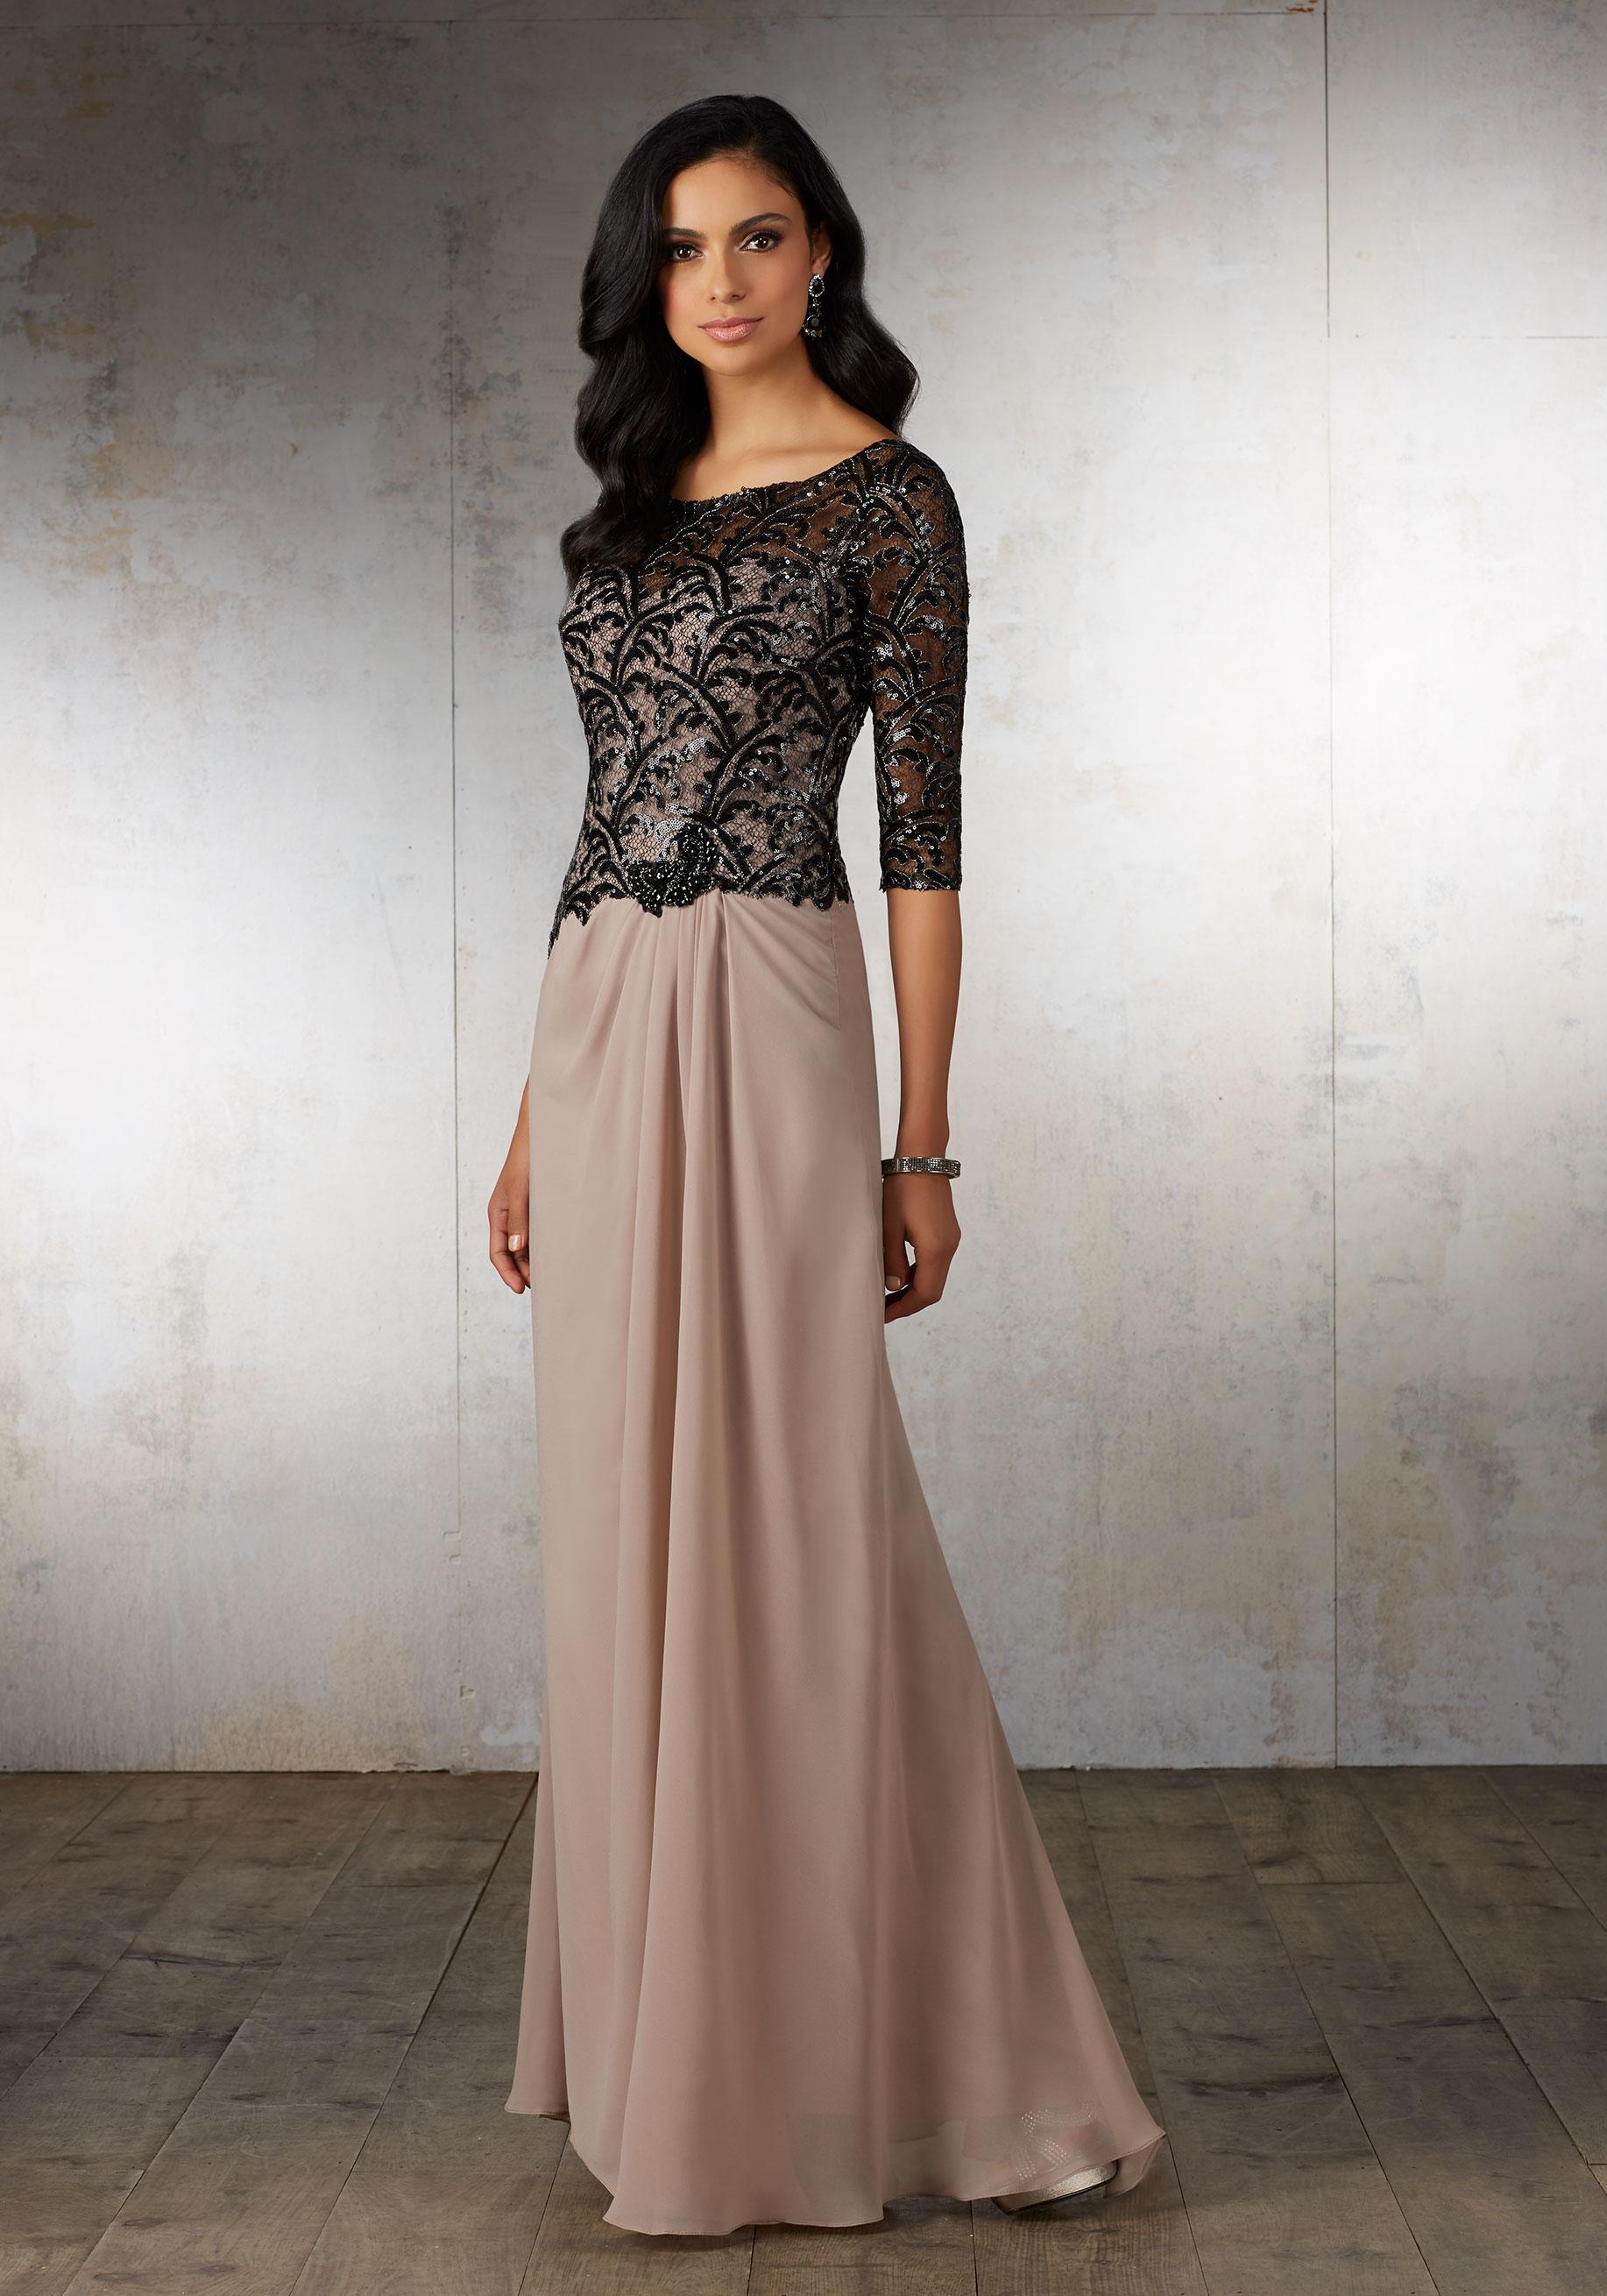 special occasion evening dresses photo - 1